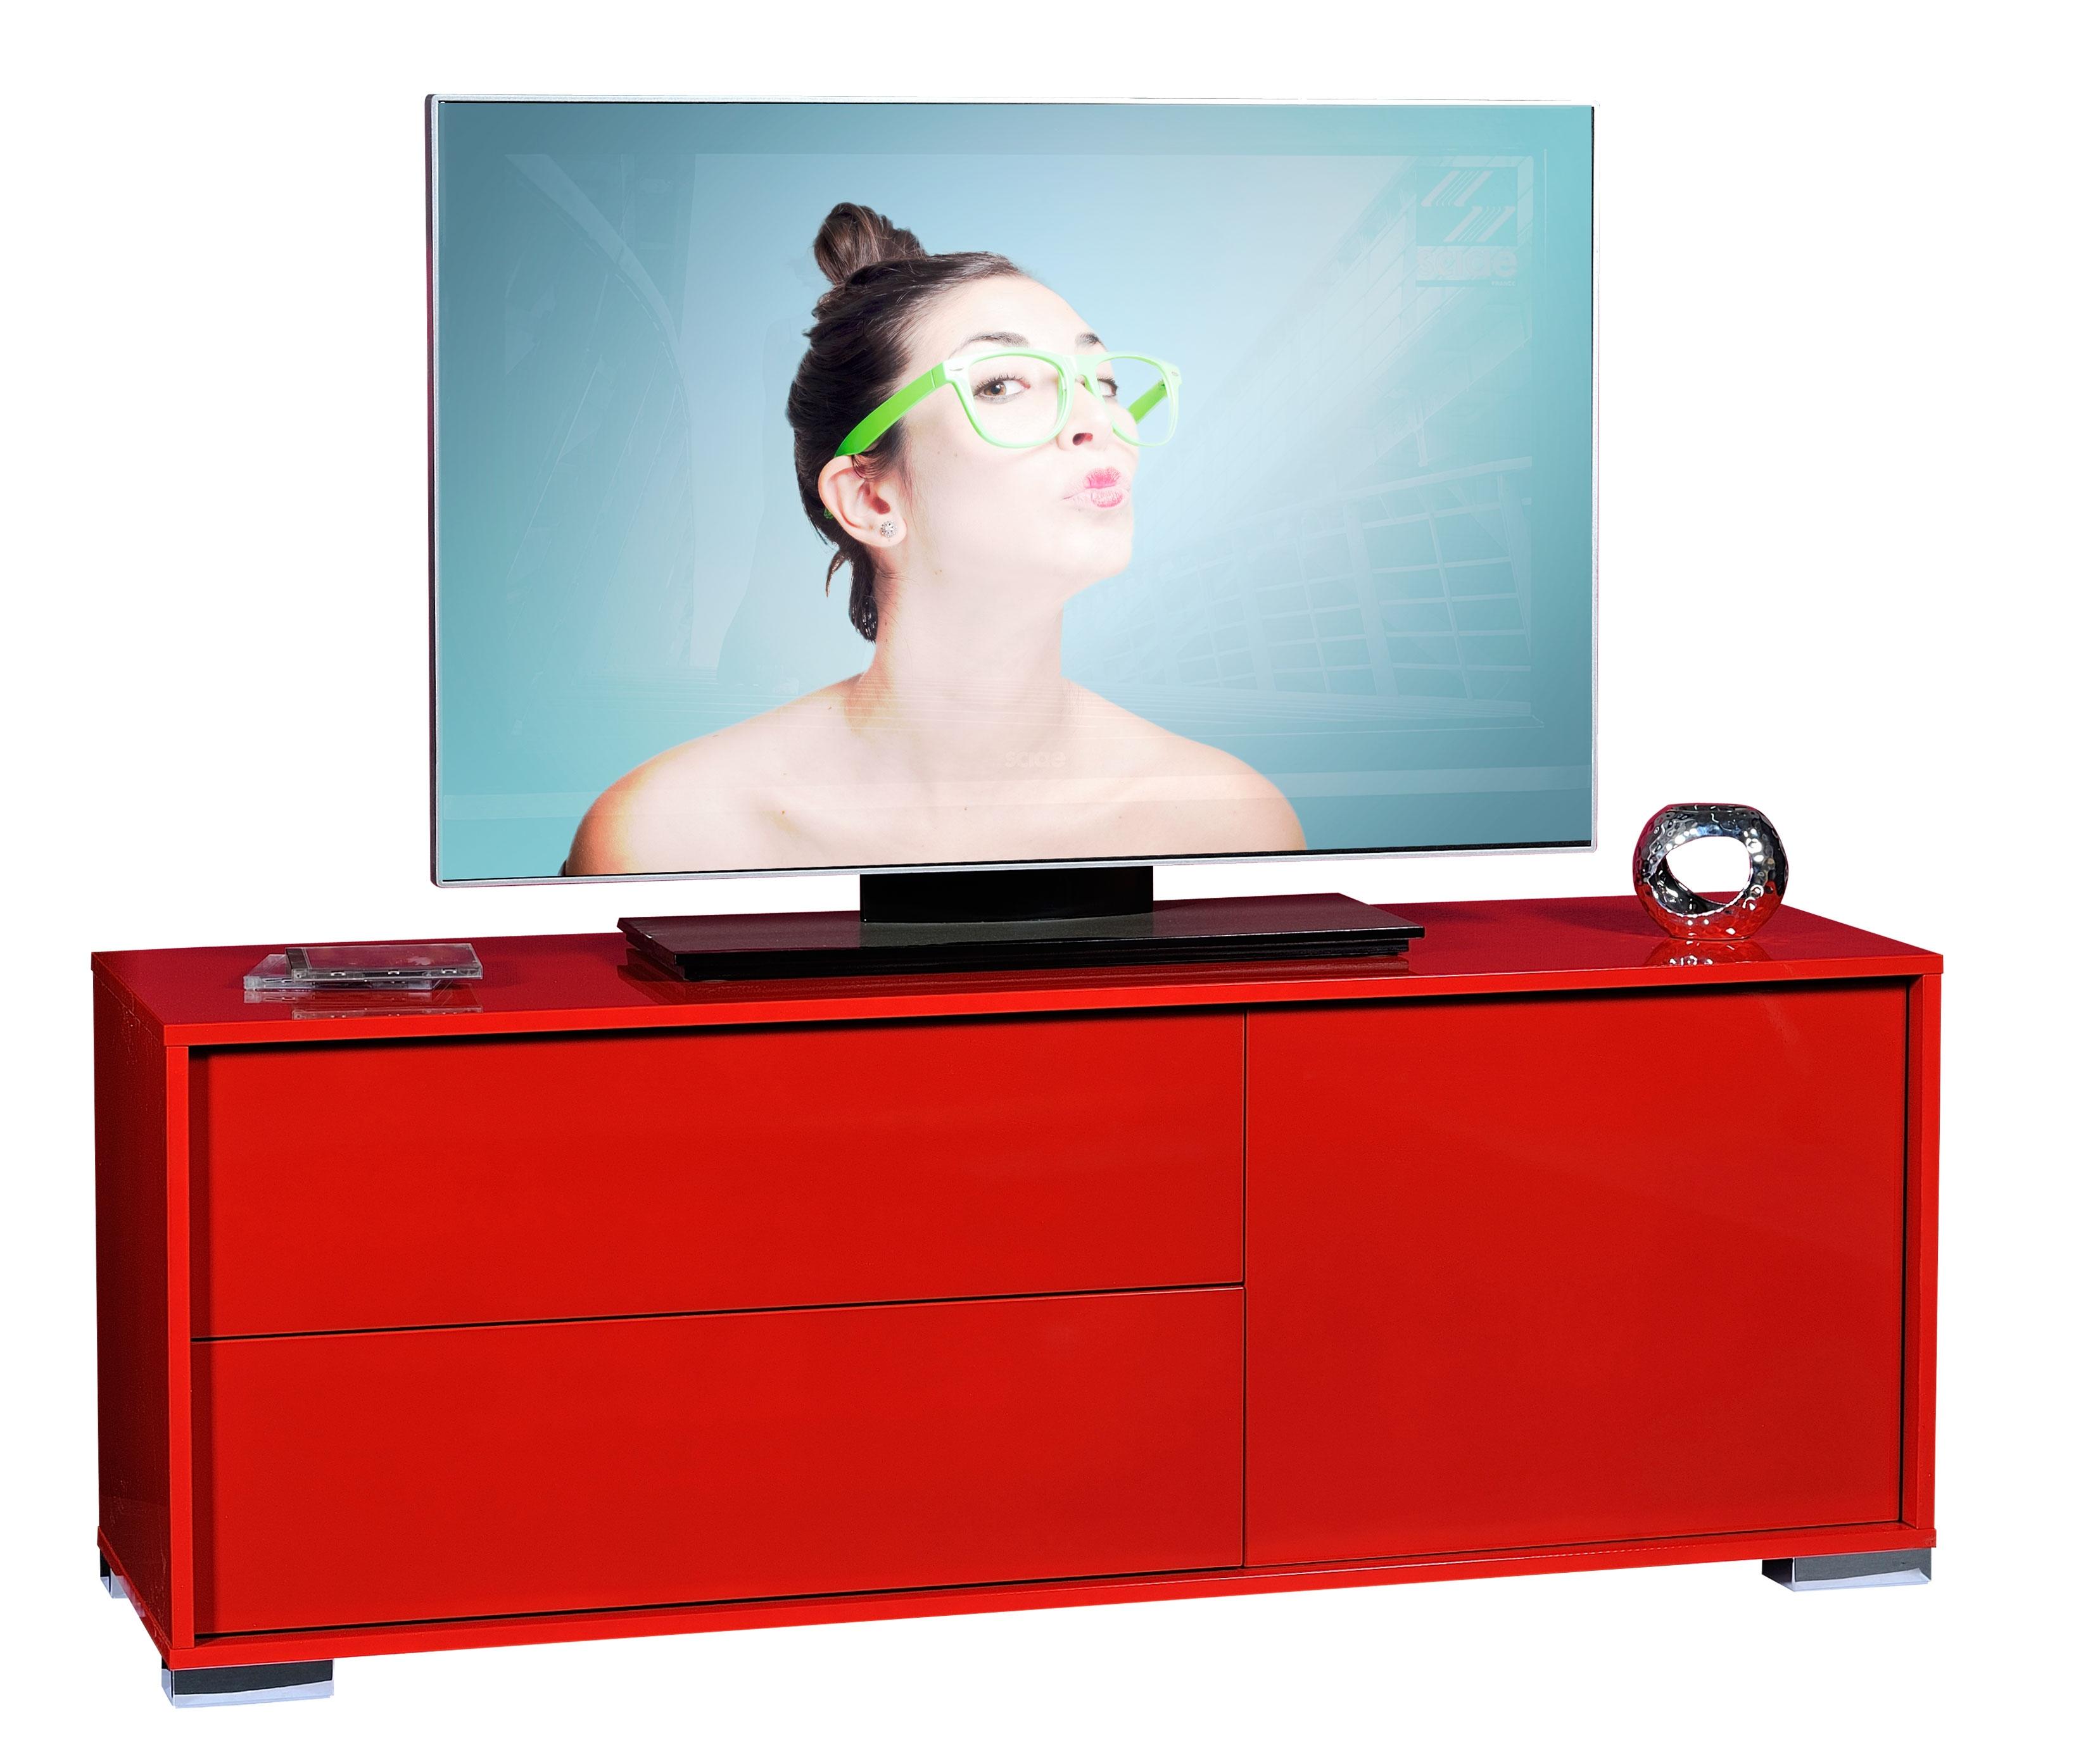 Meuble Tv Moderne Rouge : Les Tendances Meuble Tv Rouge Brillant Like